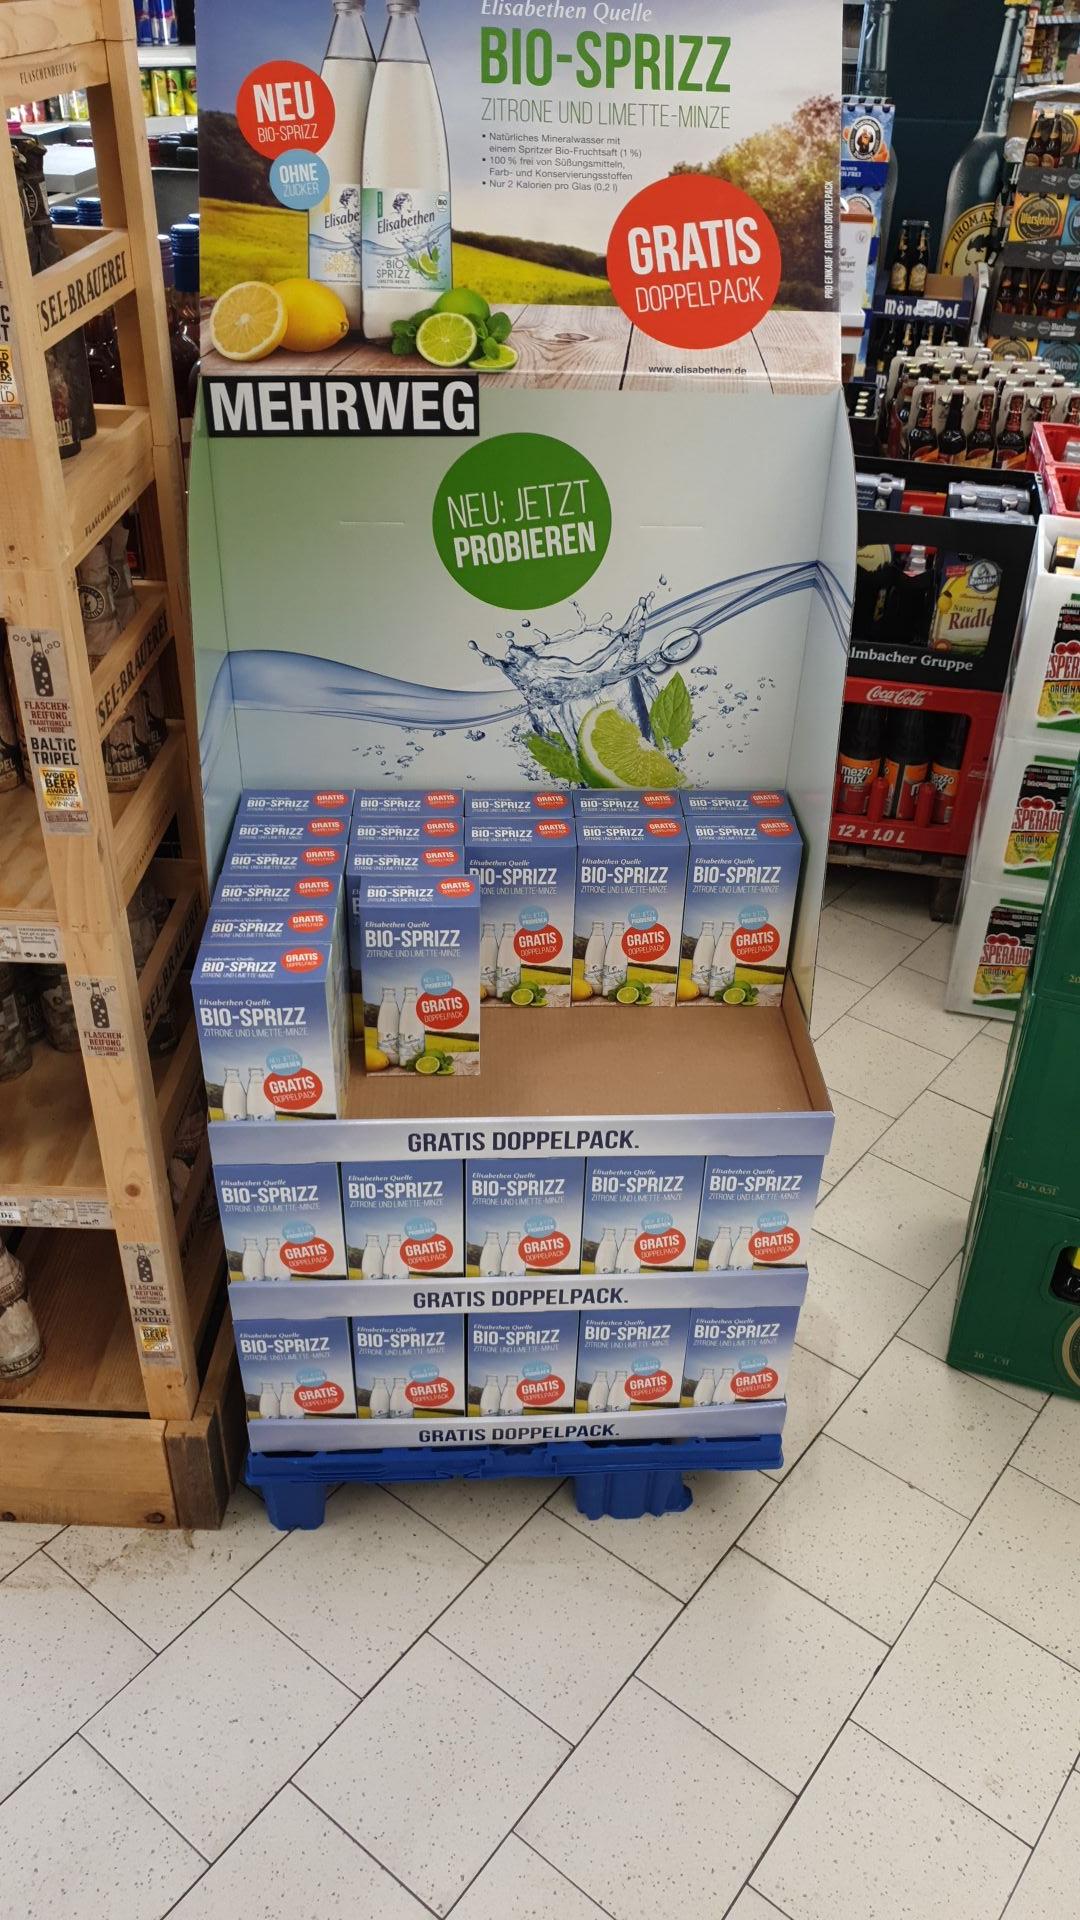 [Lokal] Wiesbaden toom - Gratis Doppelpack Bio-Spritz